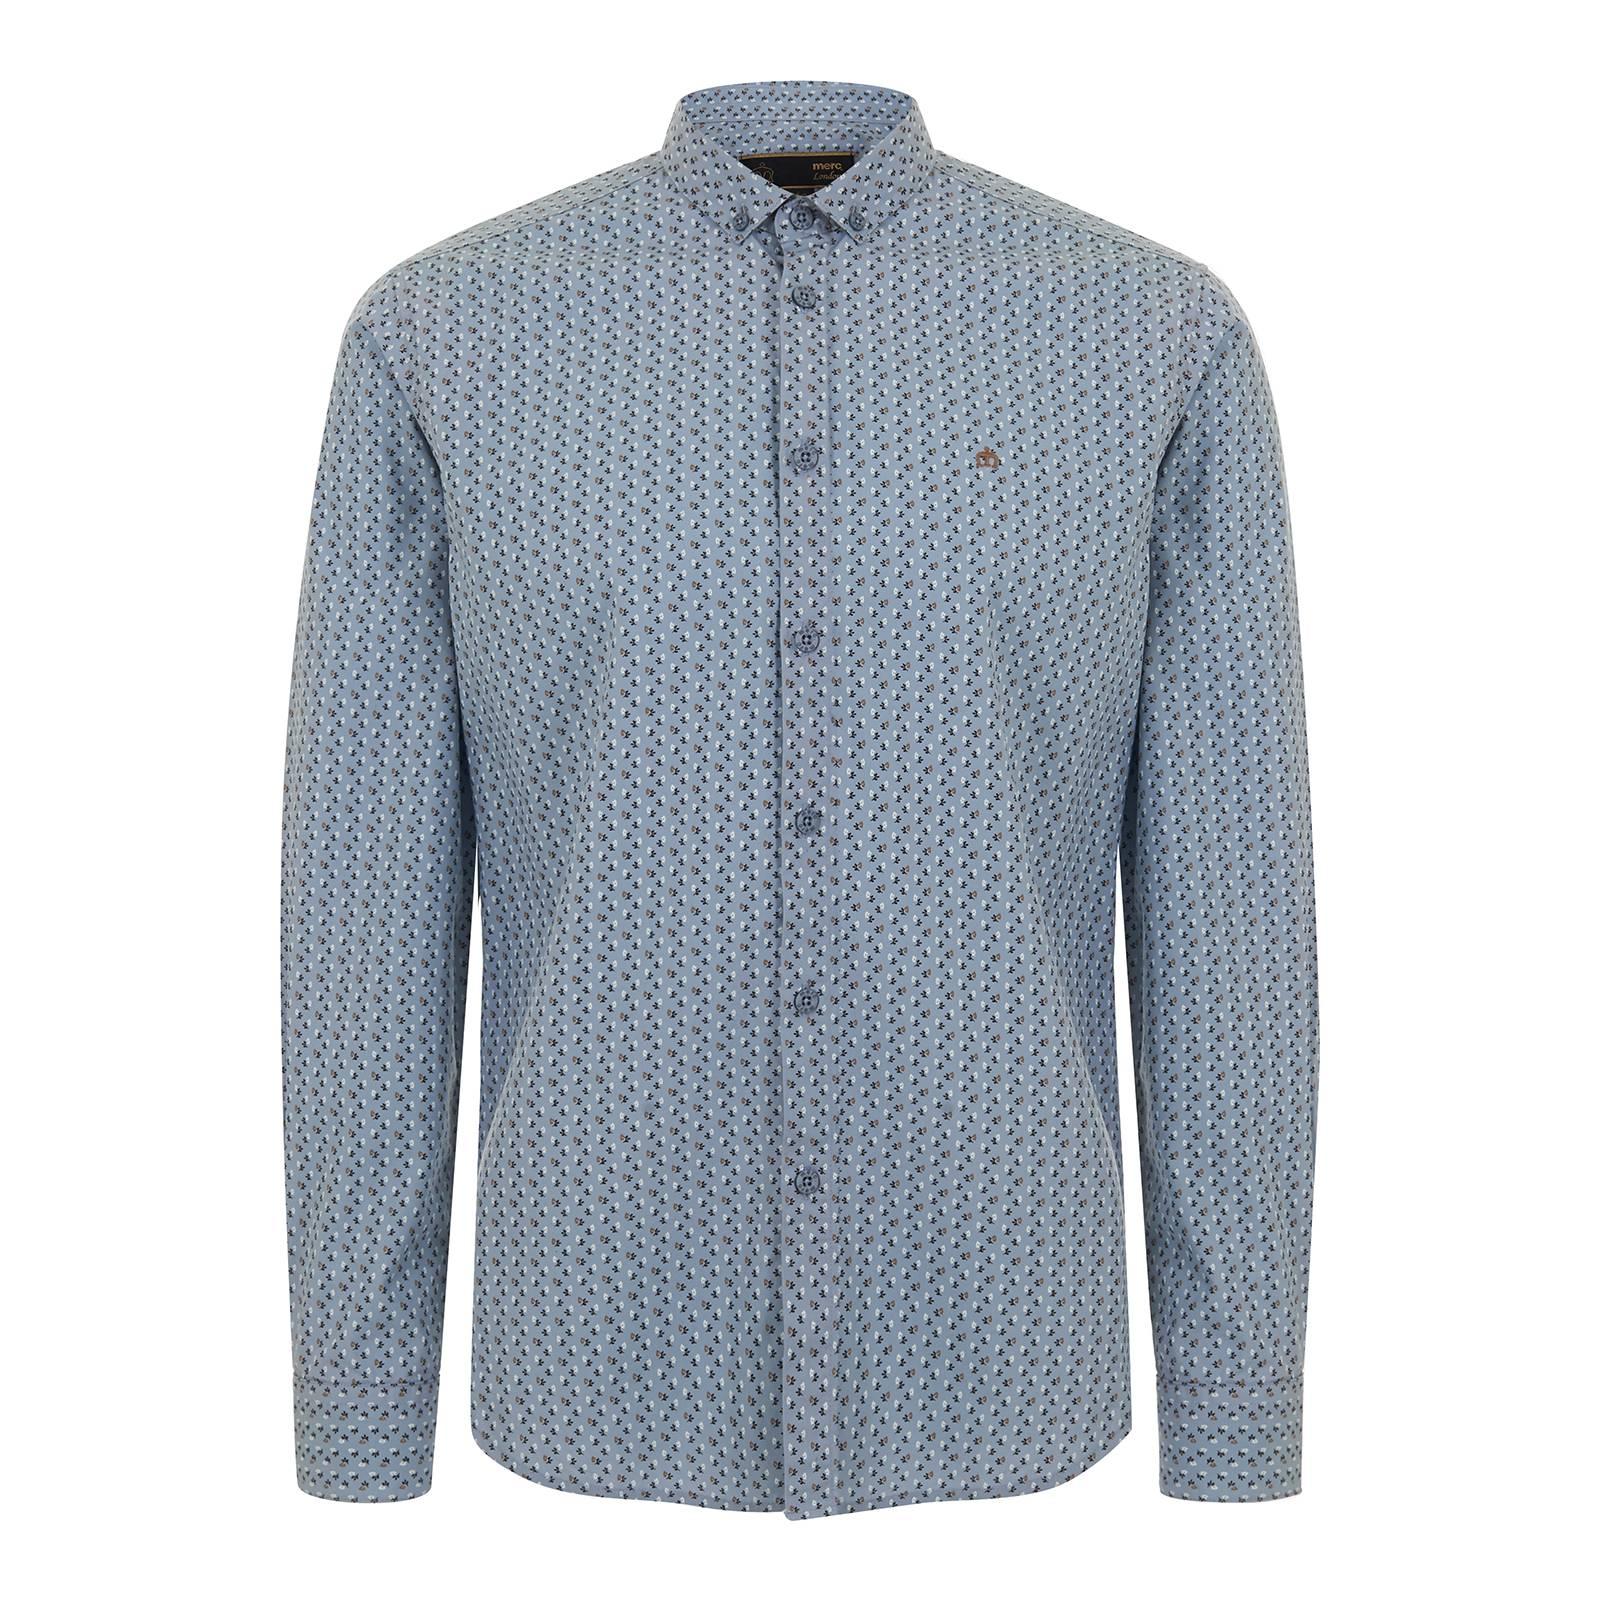 Рубашка SistoРубашки<br><br><br>Артикул: 1515206<br>Материал: 100% хлопок<br>Цвет: синяя сталь<br>Пол: Мужской